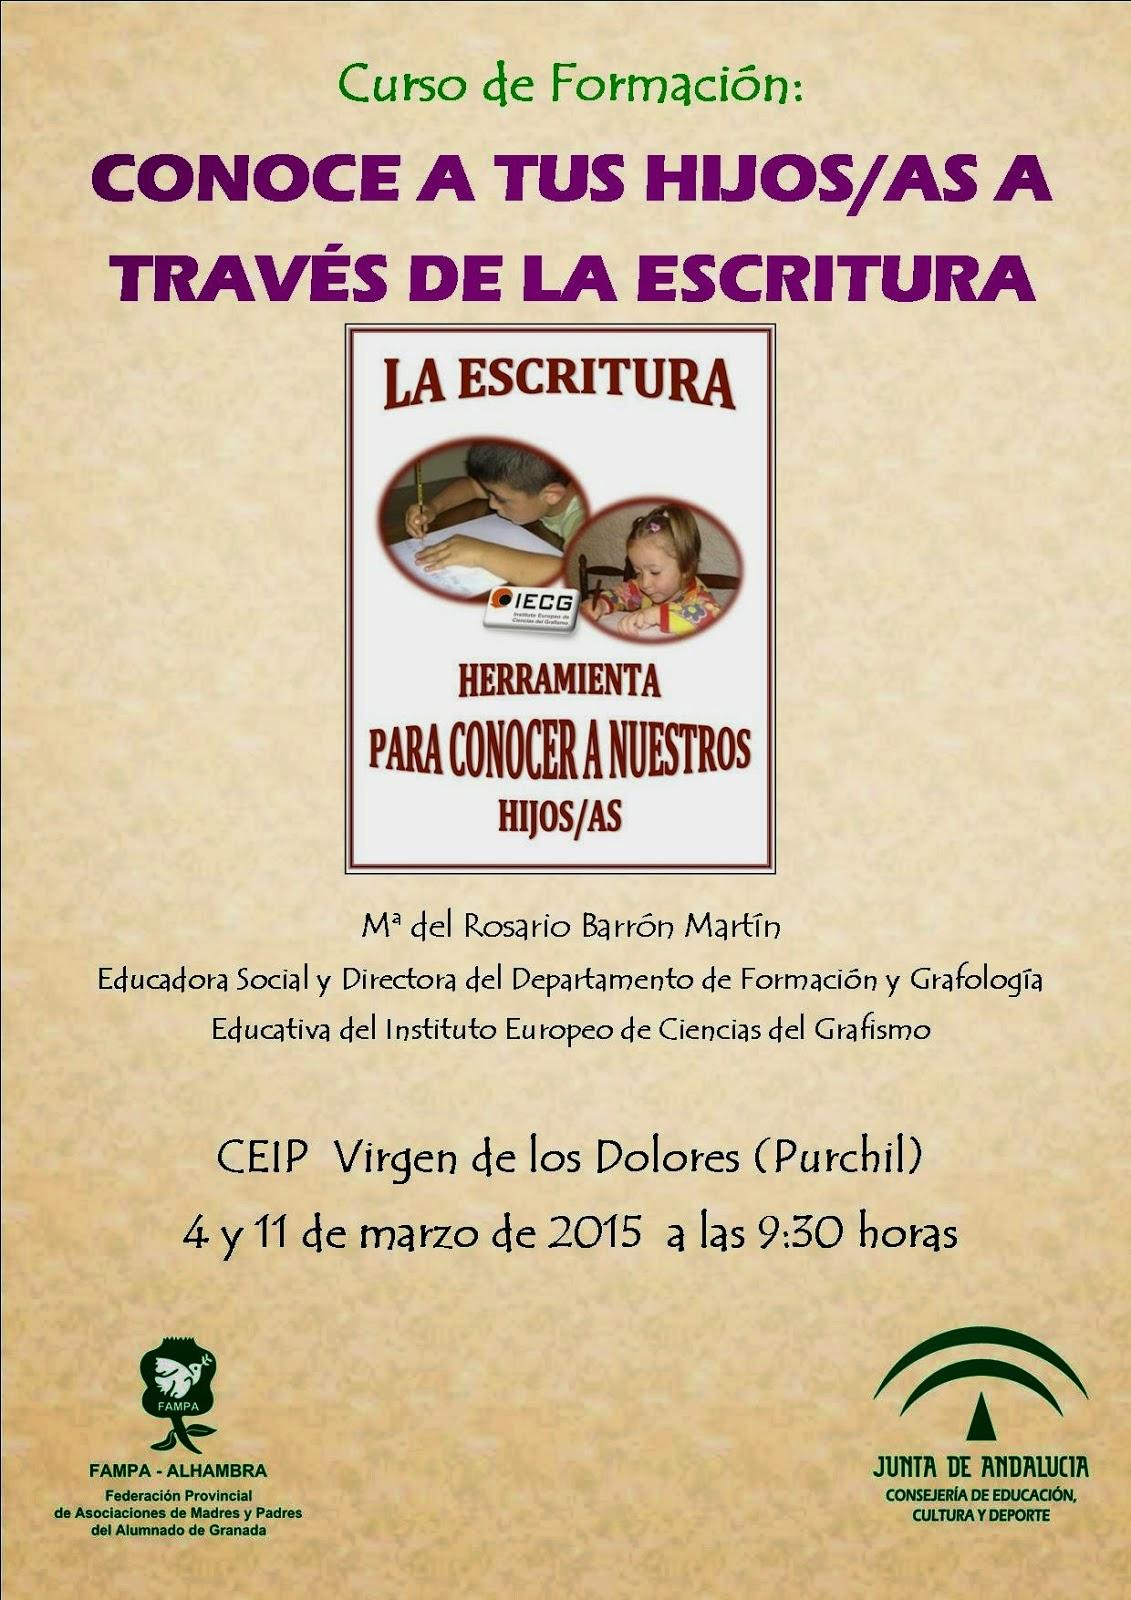 http://fampaalhambragranada.blogspot.com.es/2015/02/formacion-de-las-familias-purchil-vegas.html?spref=fb